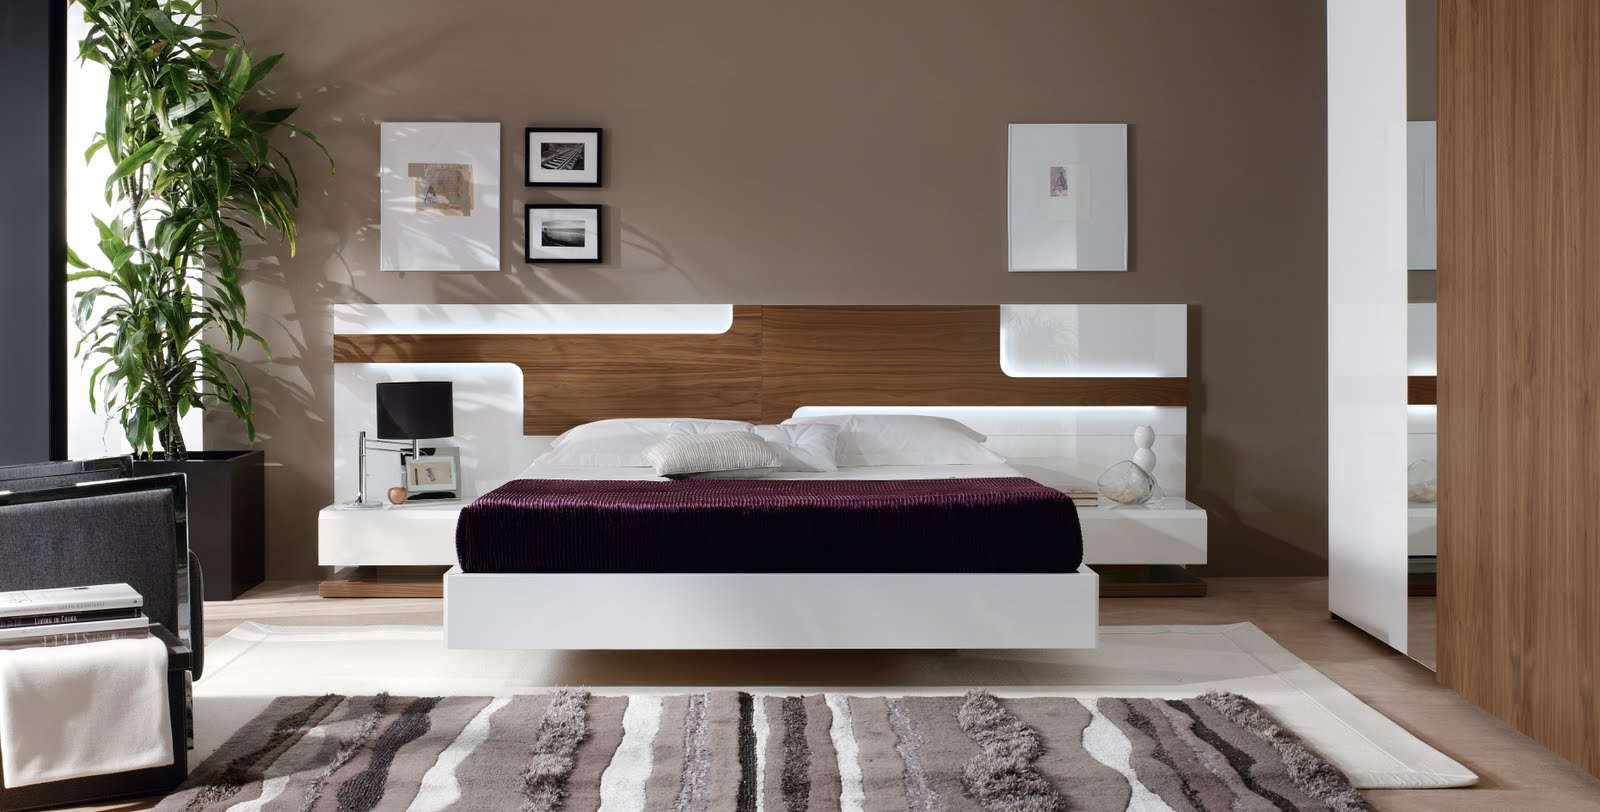 Dormitorios de matrimonio living for Decoracion habitacion matrimonio moderna